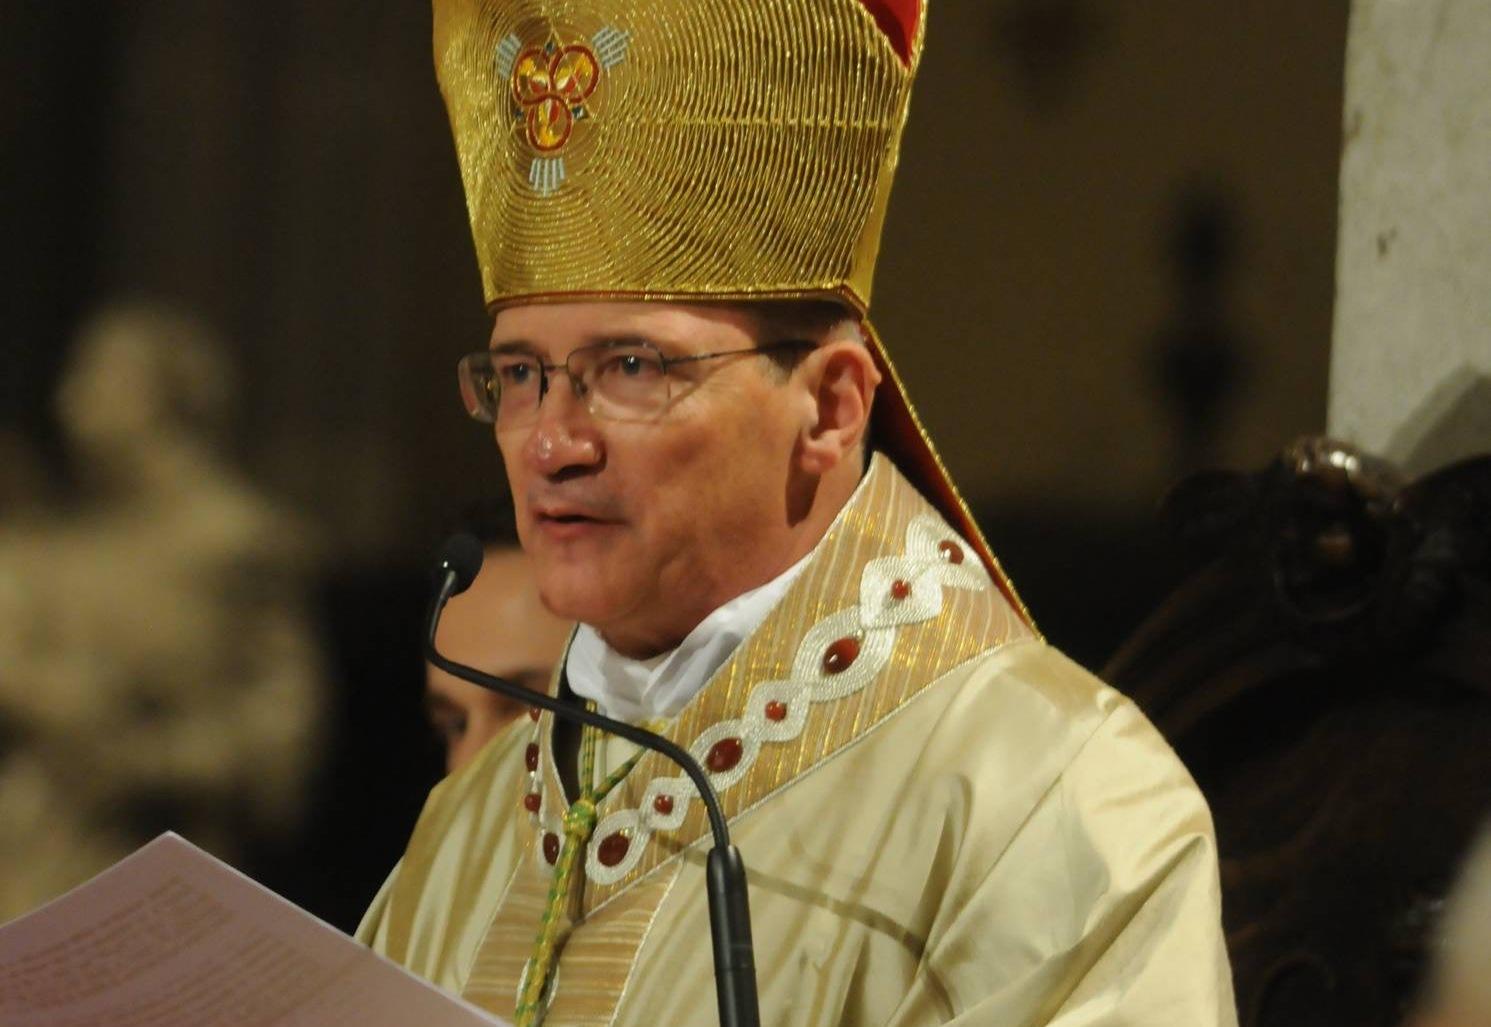 Bumbaca Gorizia    14.10.2012 Nuovo Vescovo Carlo Redaelli - Fotografia di Pierluigi Bumbaca